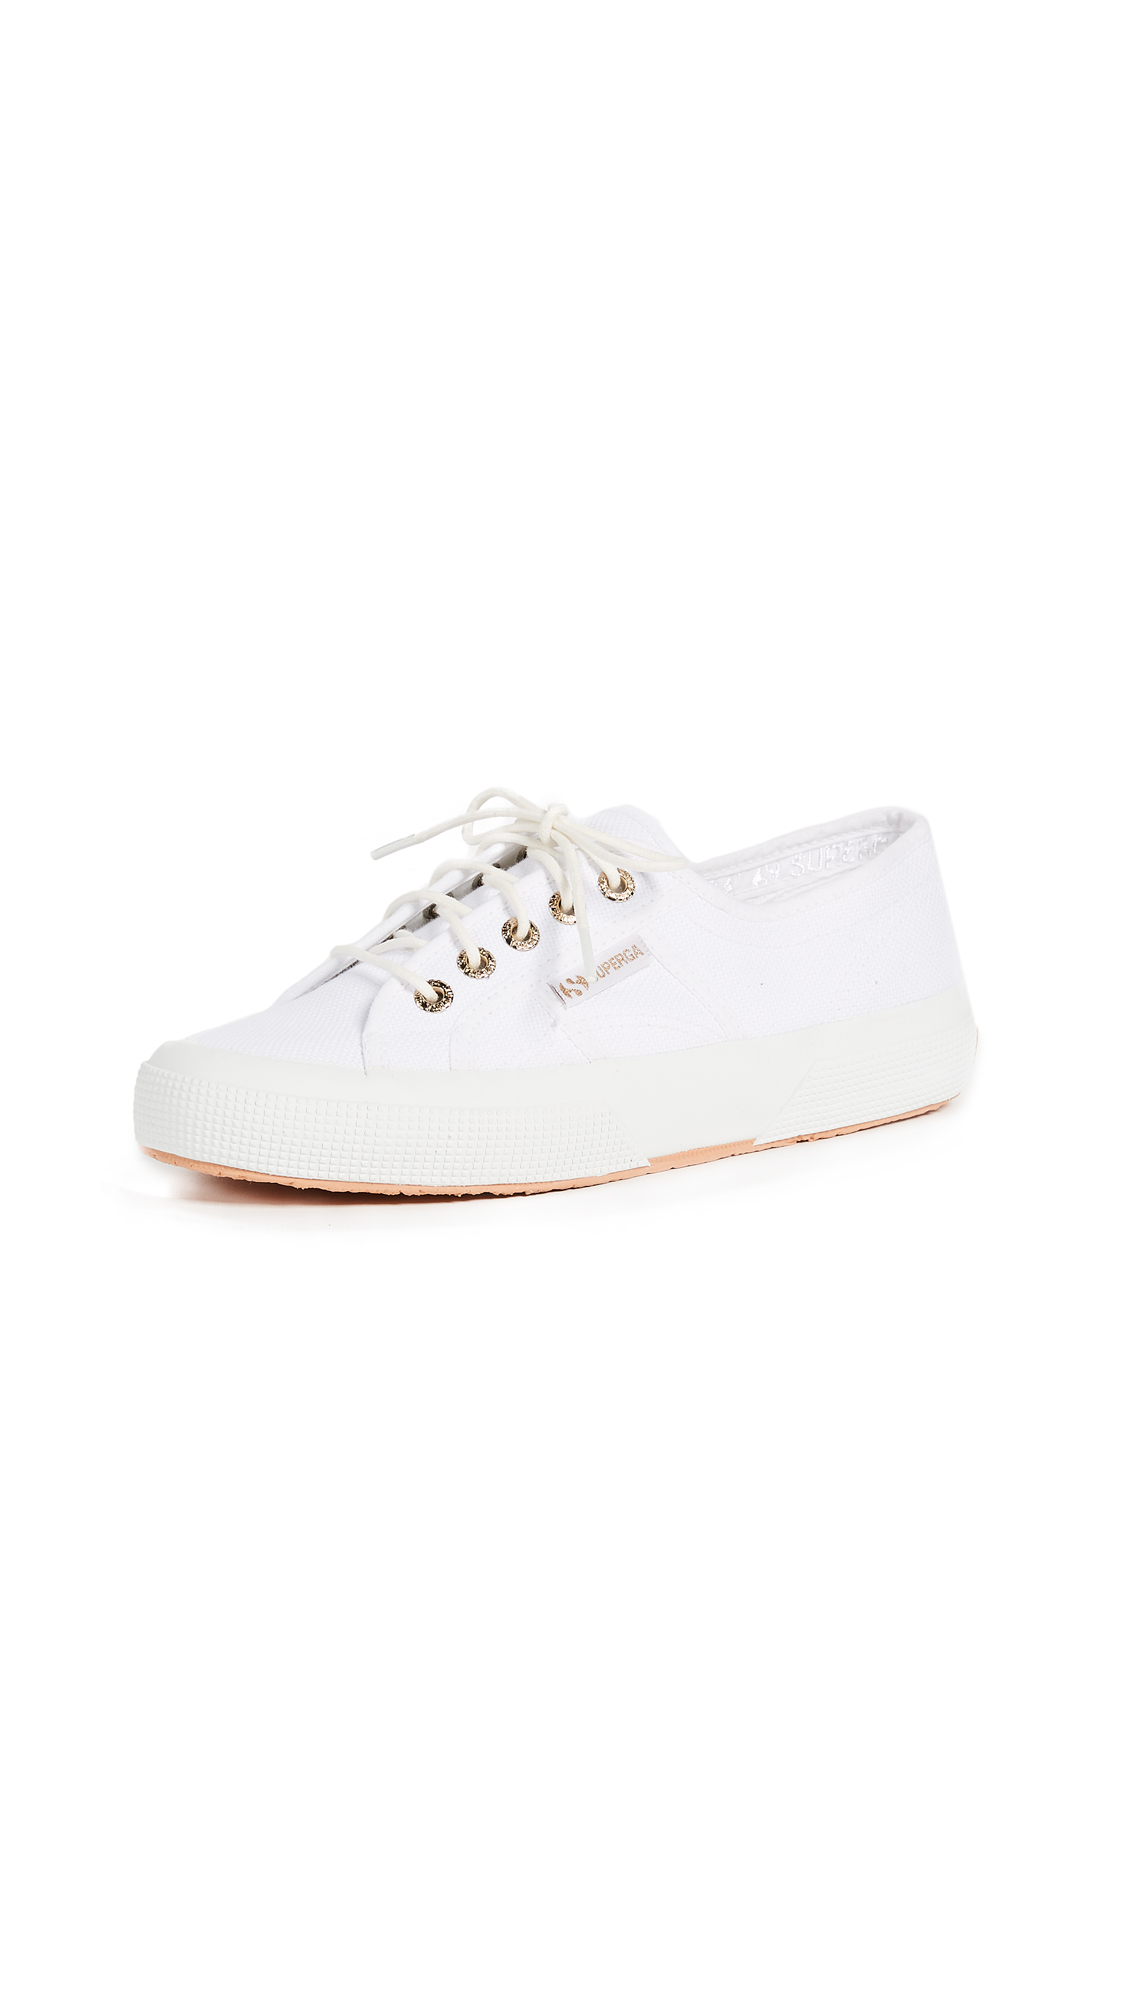 Superga 2750 Sant Ambroeus Laceup Sneakers - White